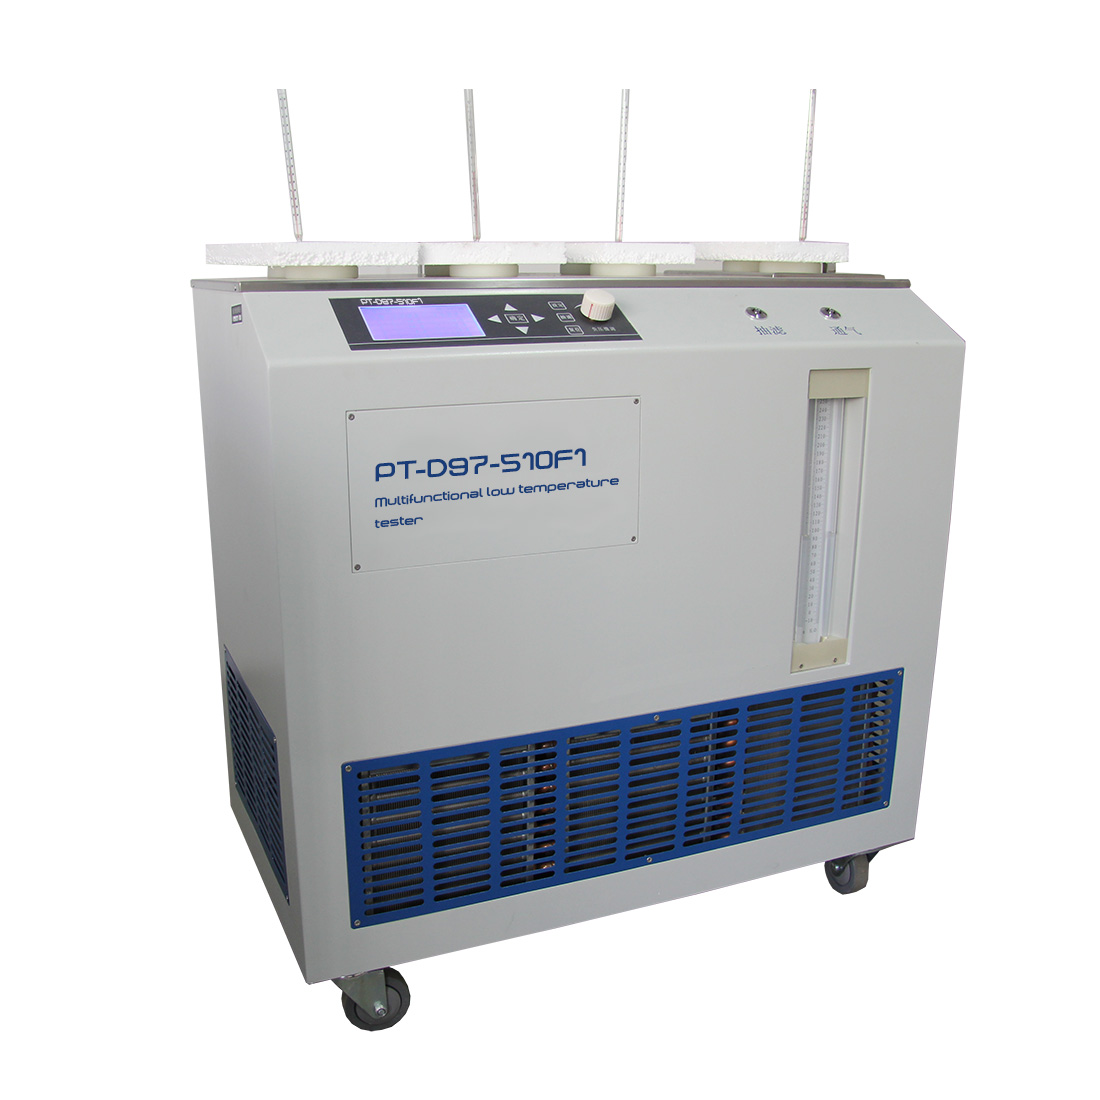 Multifunctional Low Temperature Tester